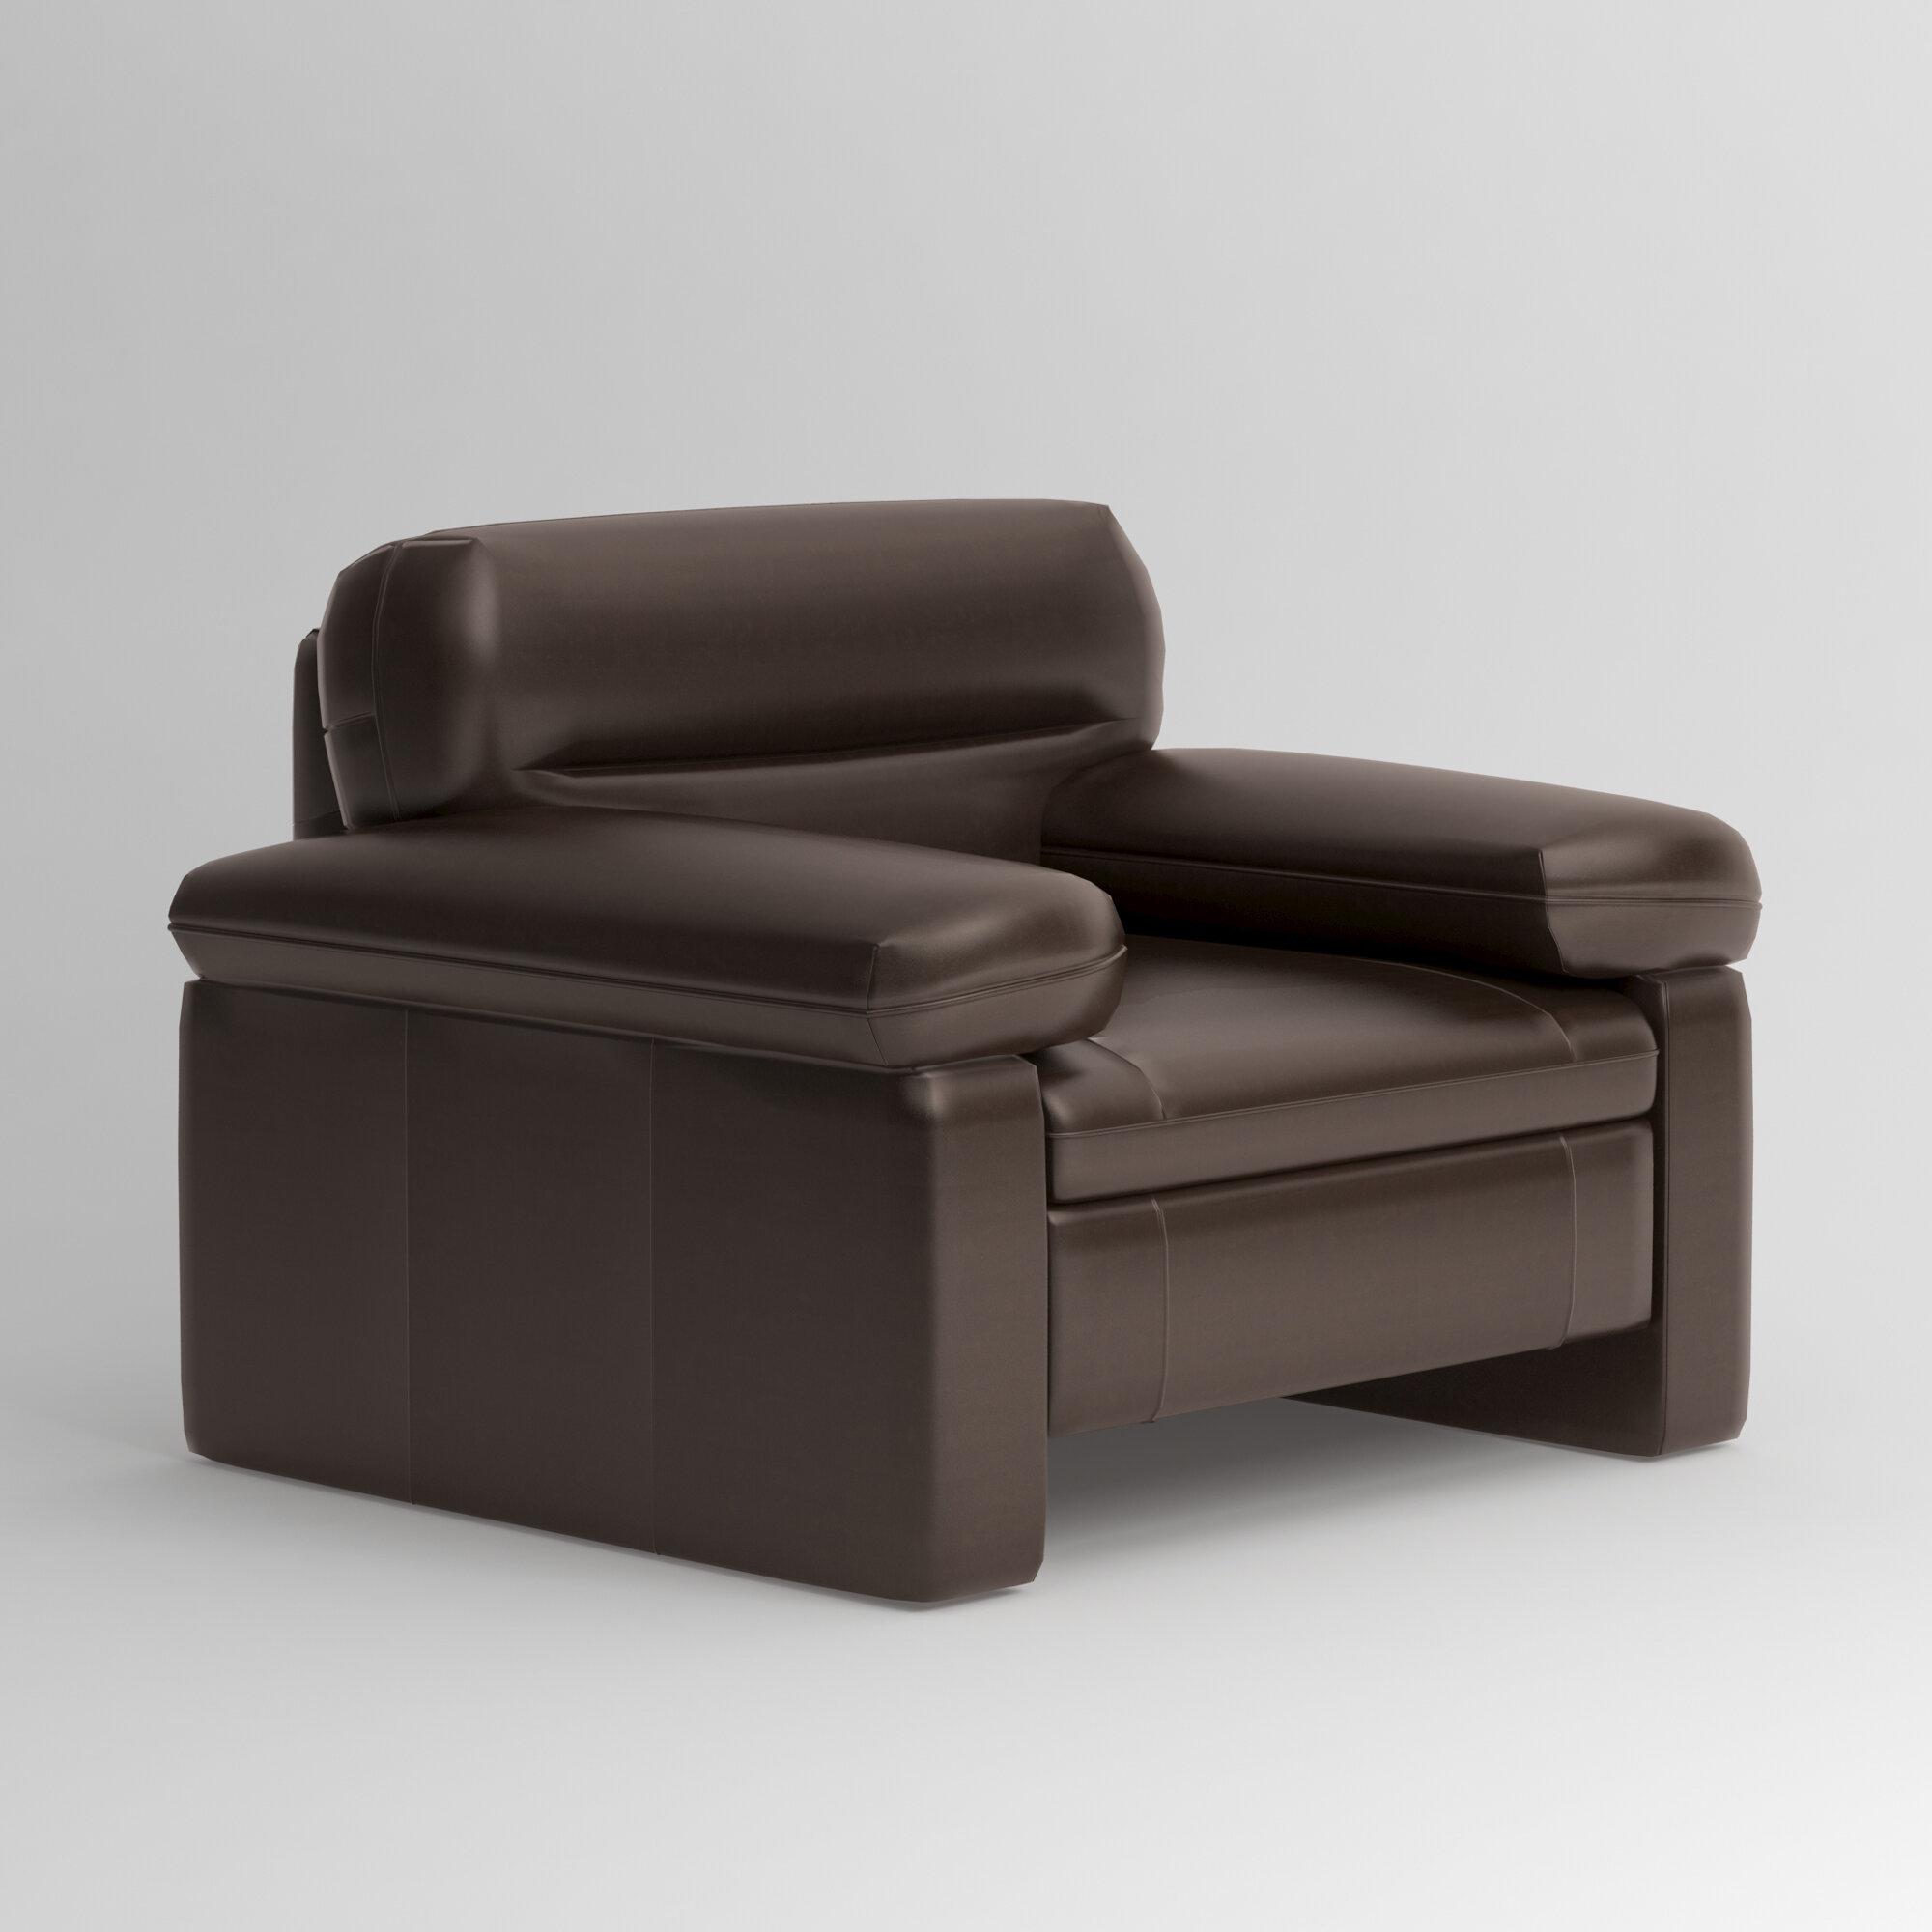 Dwell Studio Silverado Lounge Chair Leather: Pony Chocolate